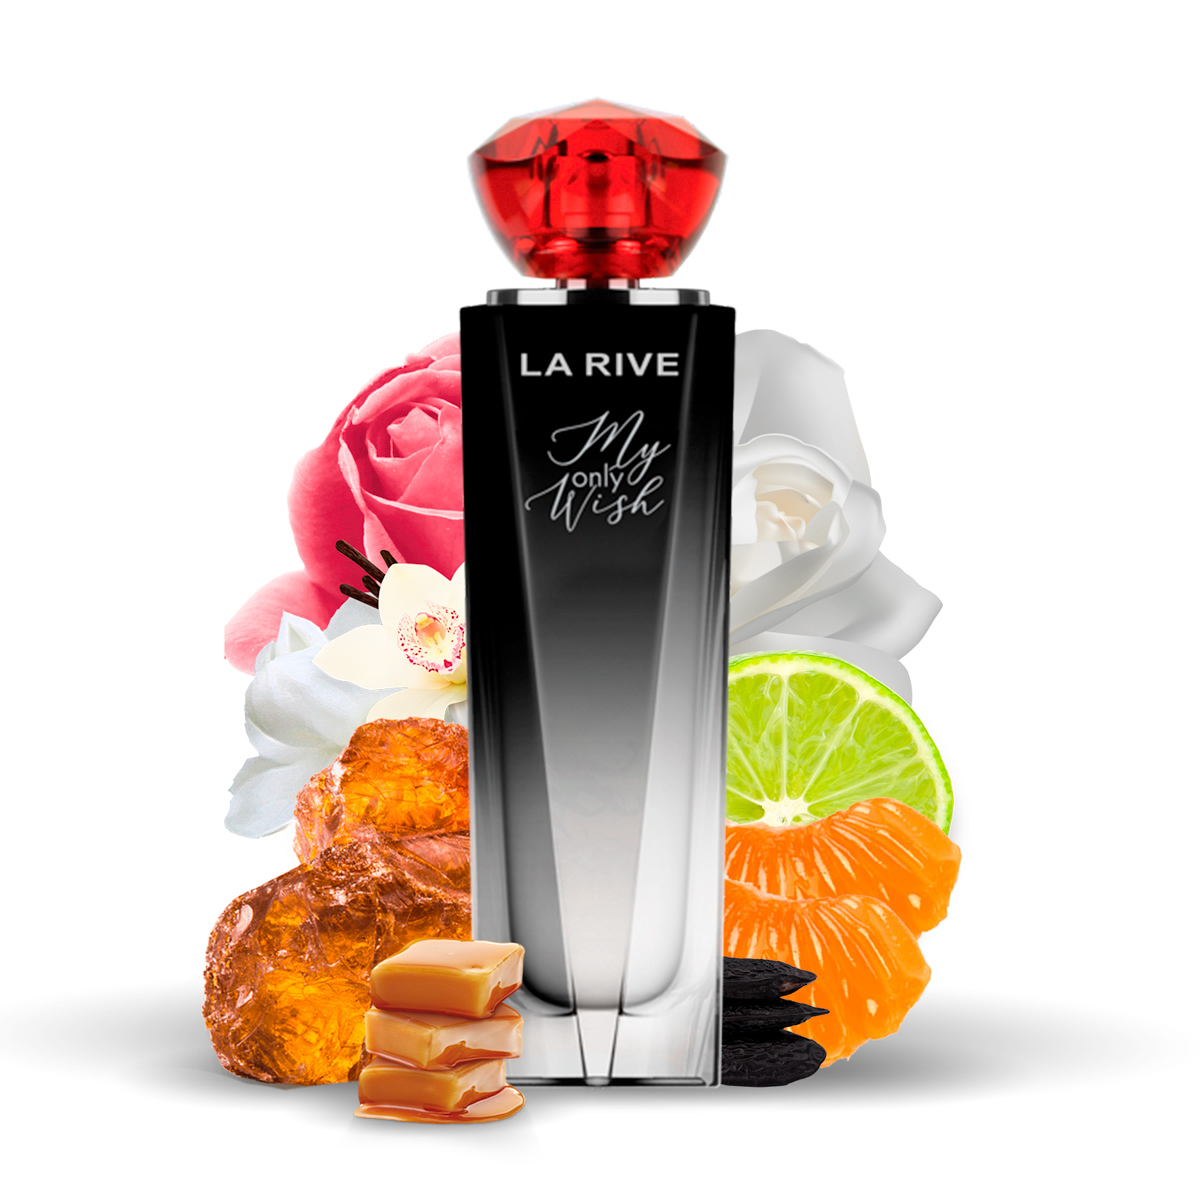 Kit 2 Perfumes My Only Wish e Body Like a Man La Rive